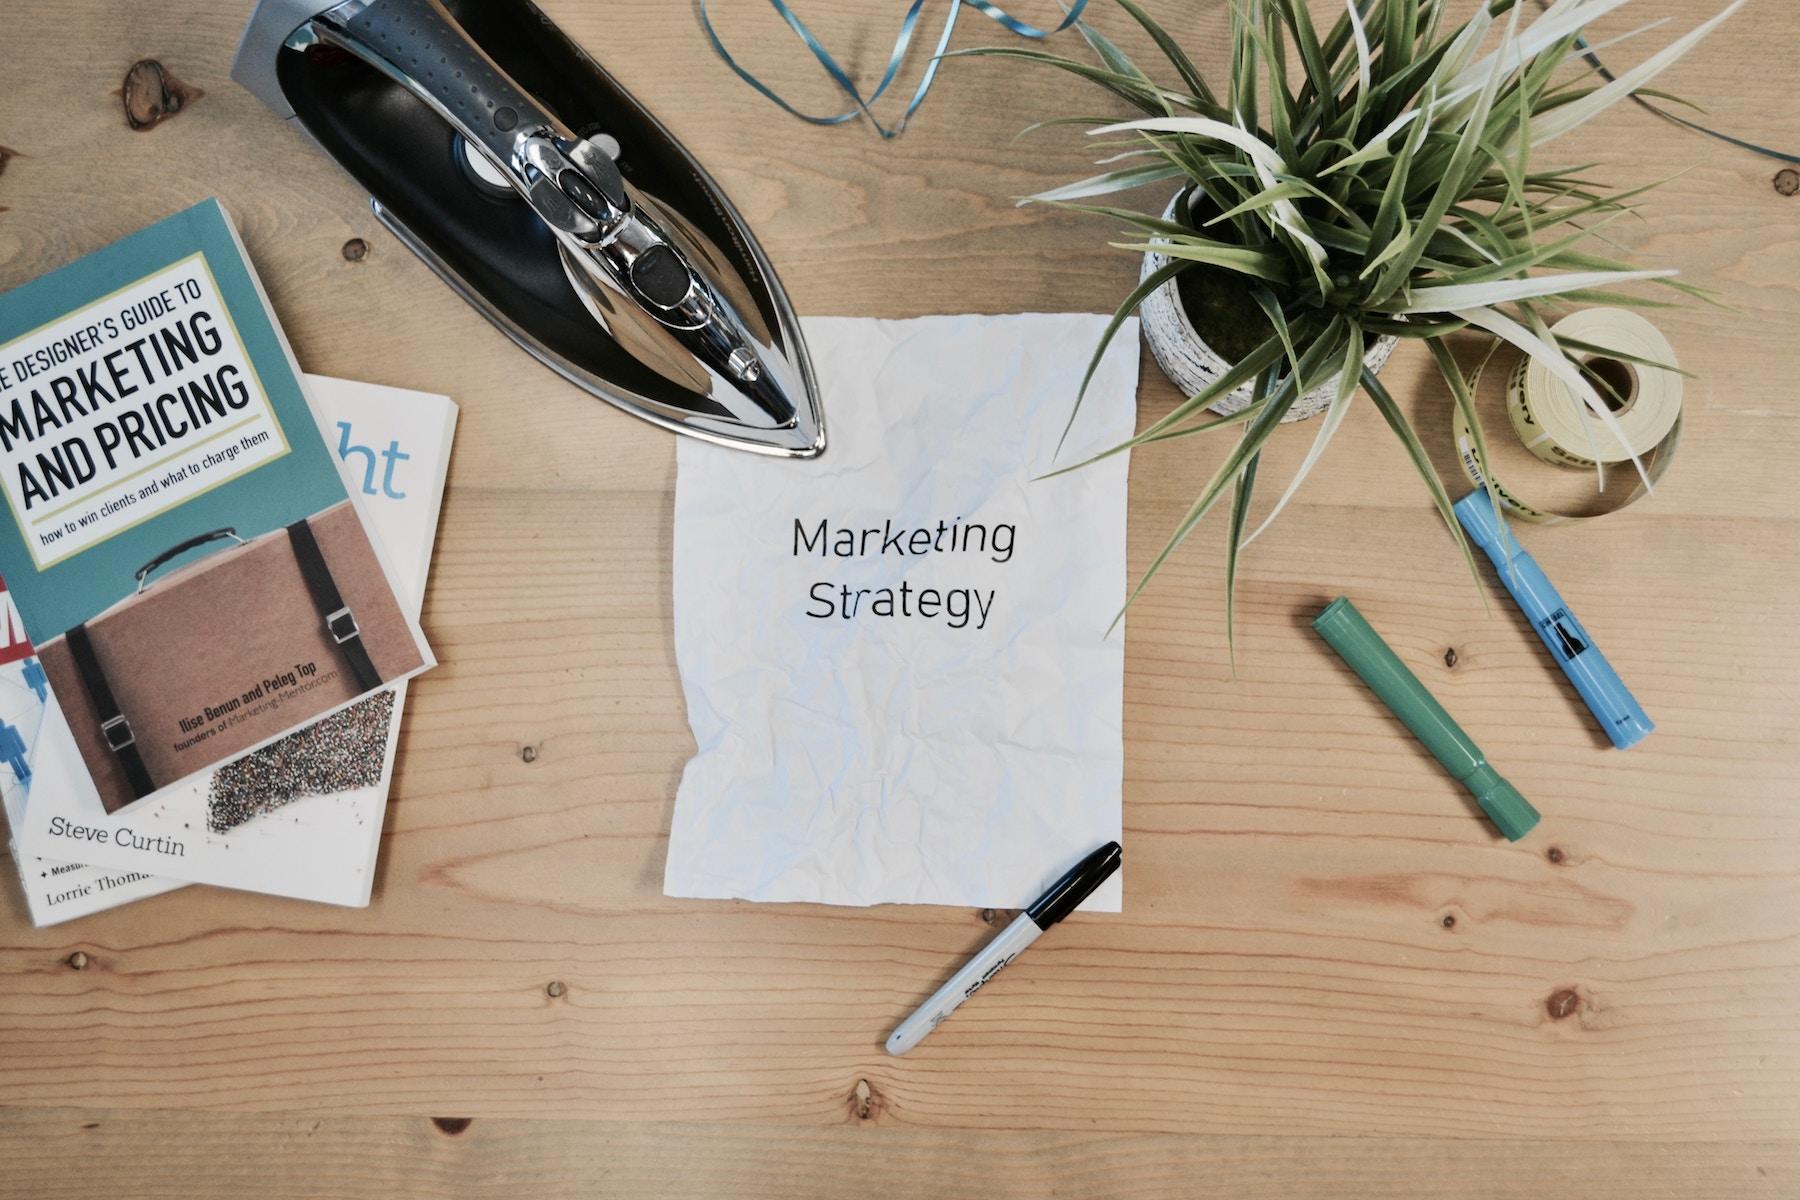 stratégie d'attractivité